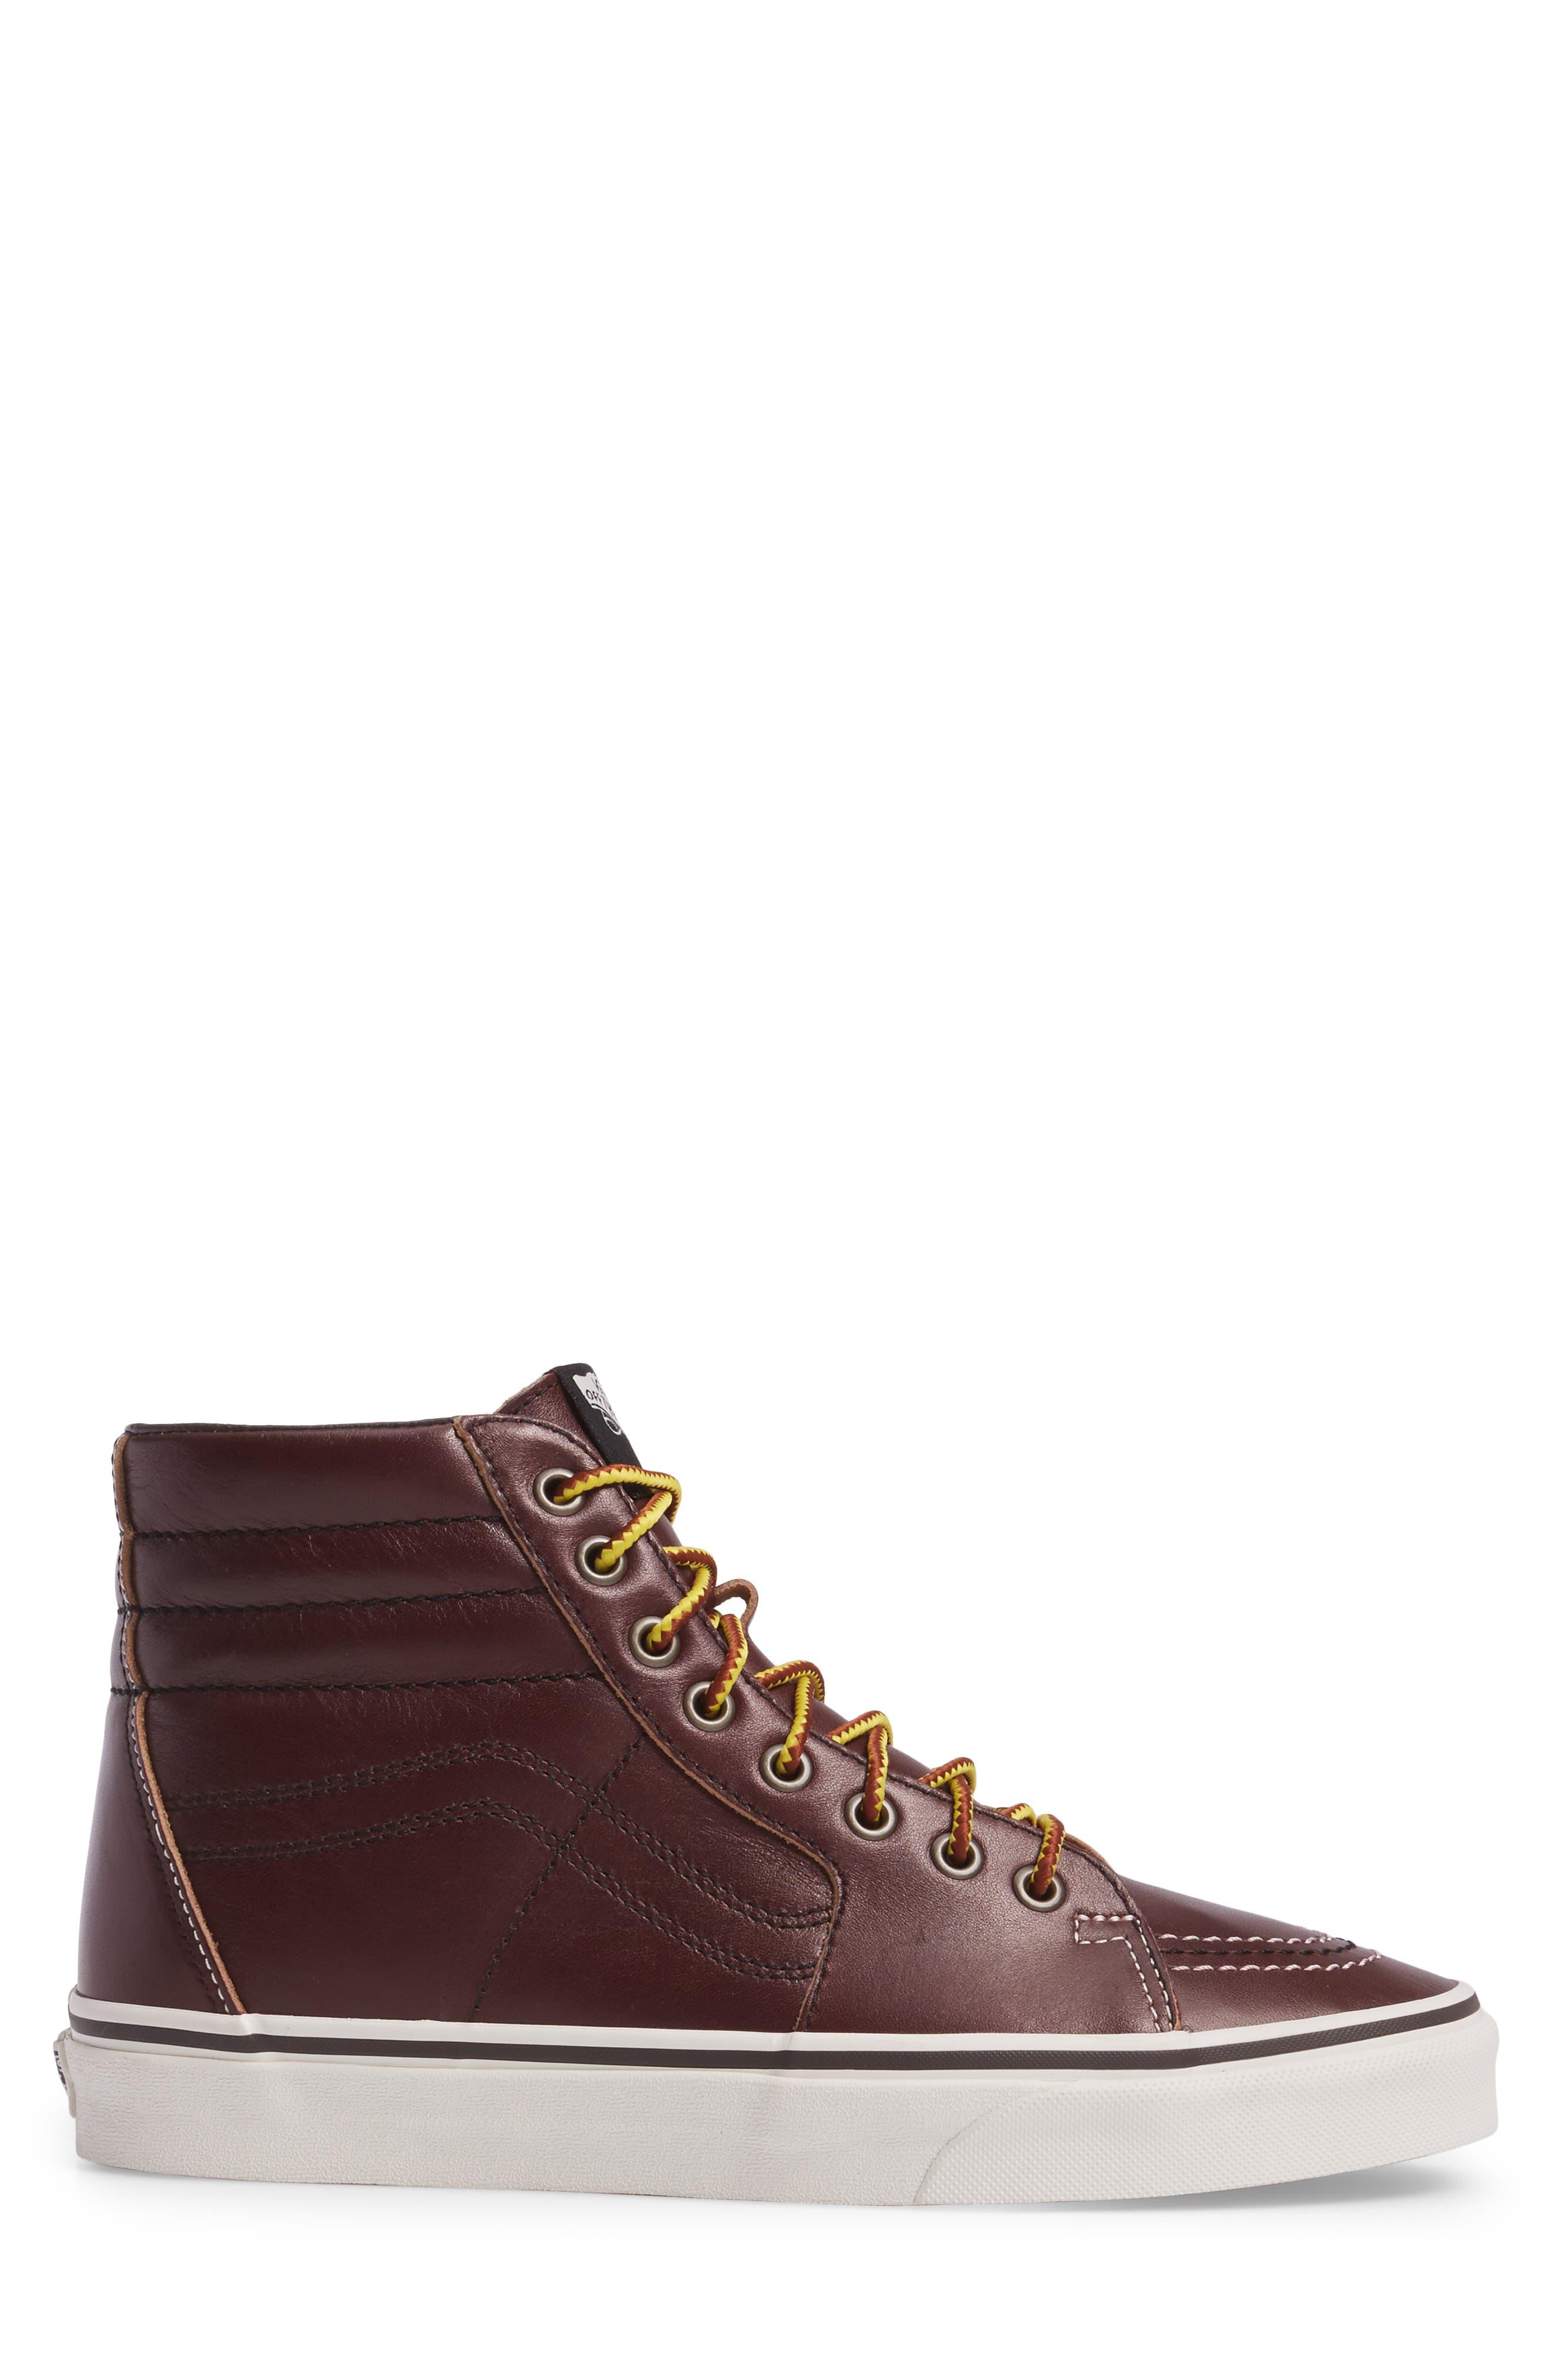 Sk8-Hi Sneaker,                             Alternate thumbnail 3, color,                             Rum Raisin/Marshmallow Leather